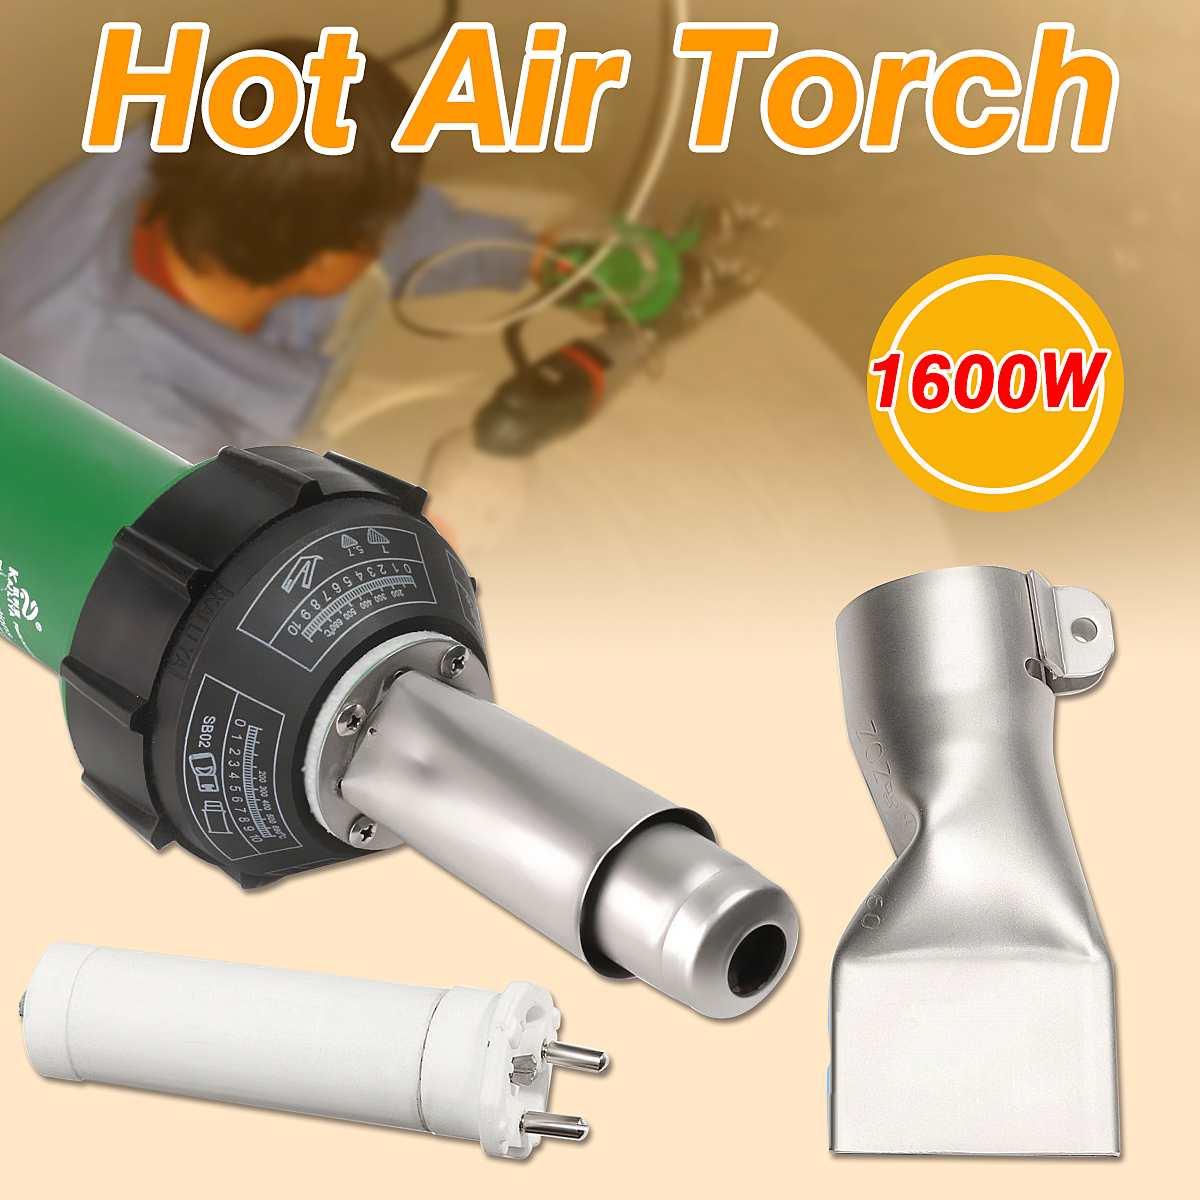 1Pcs  AC 220V 1600W 50/60Hz Hot Air Torch Plastic Welding-Gun For Welder + Flat Nose Wholesale Price High Quality